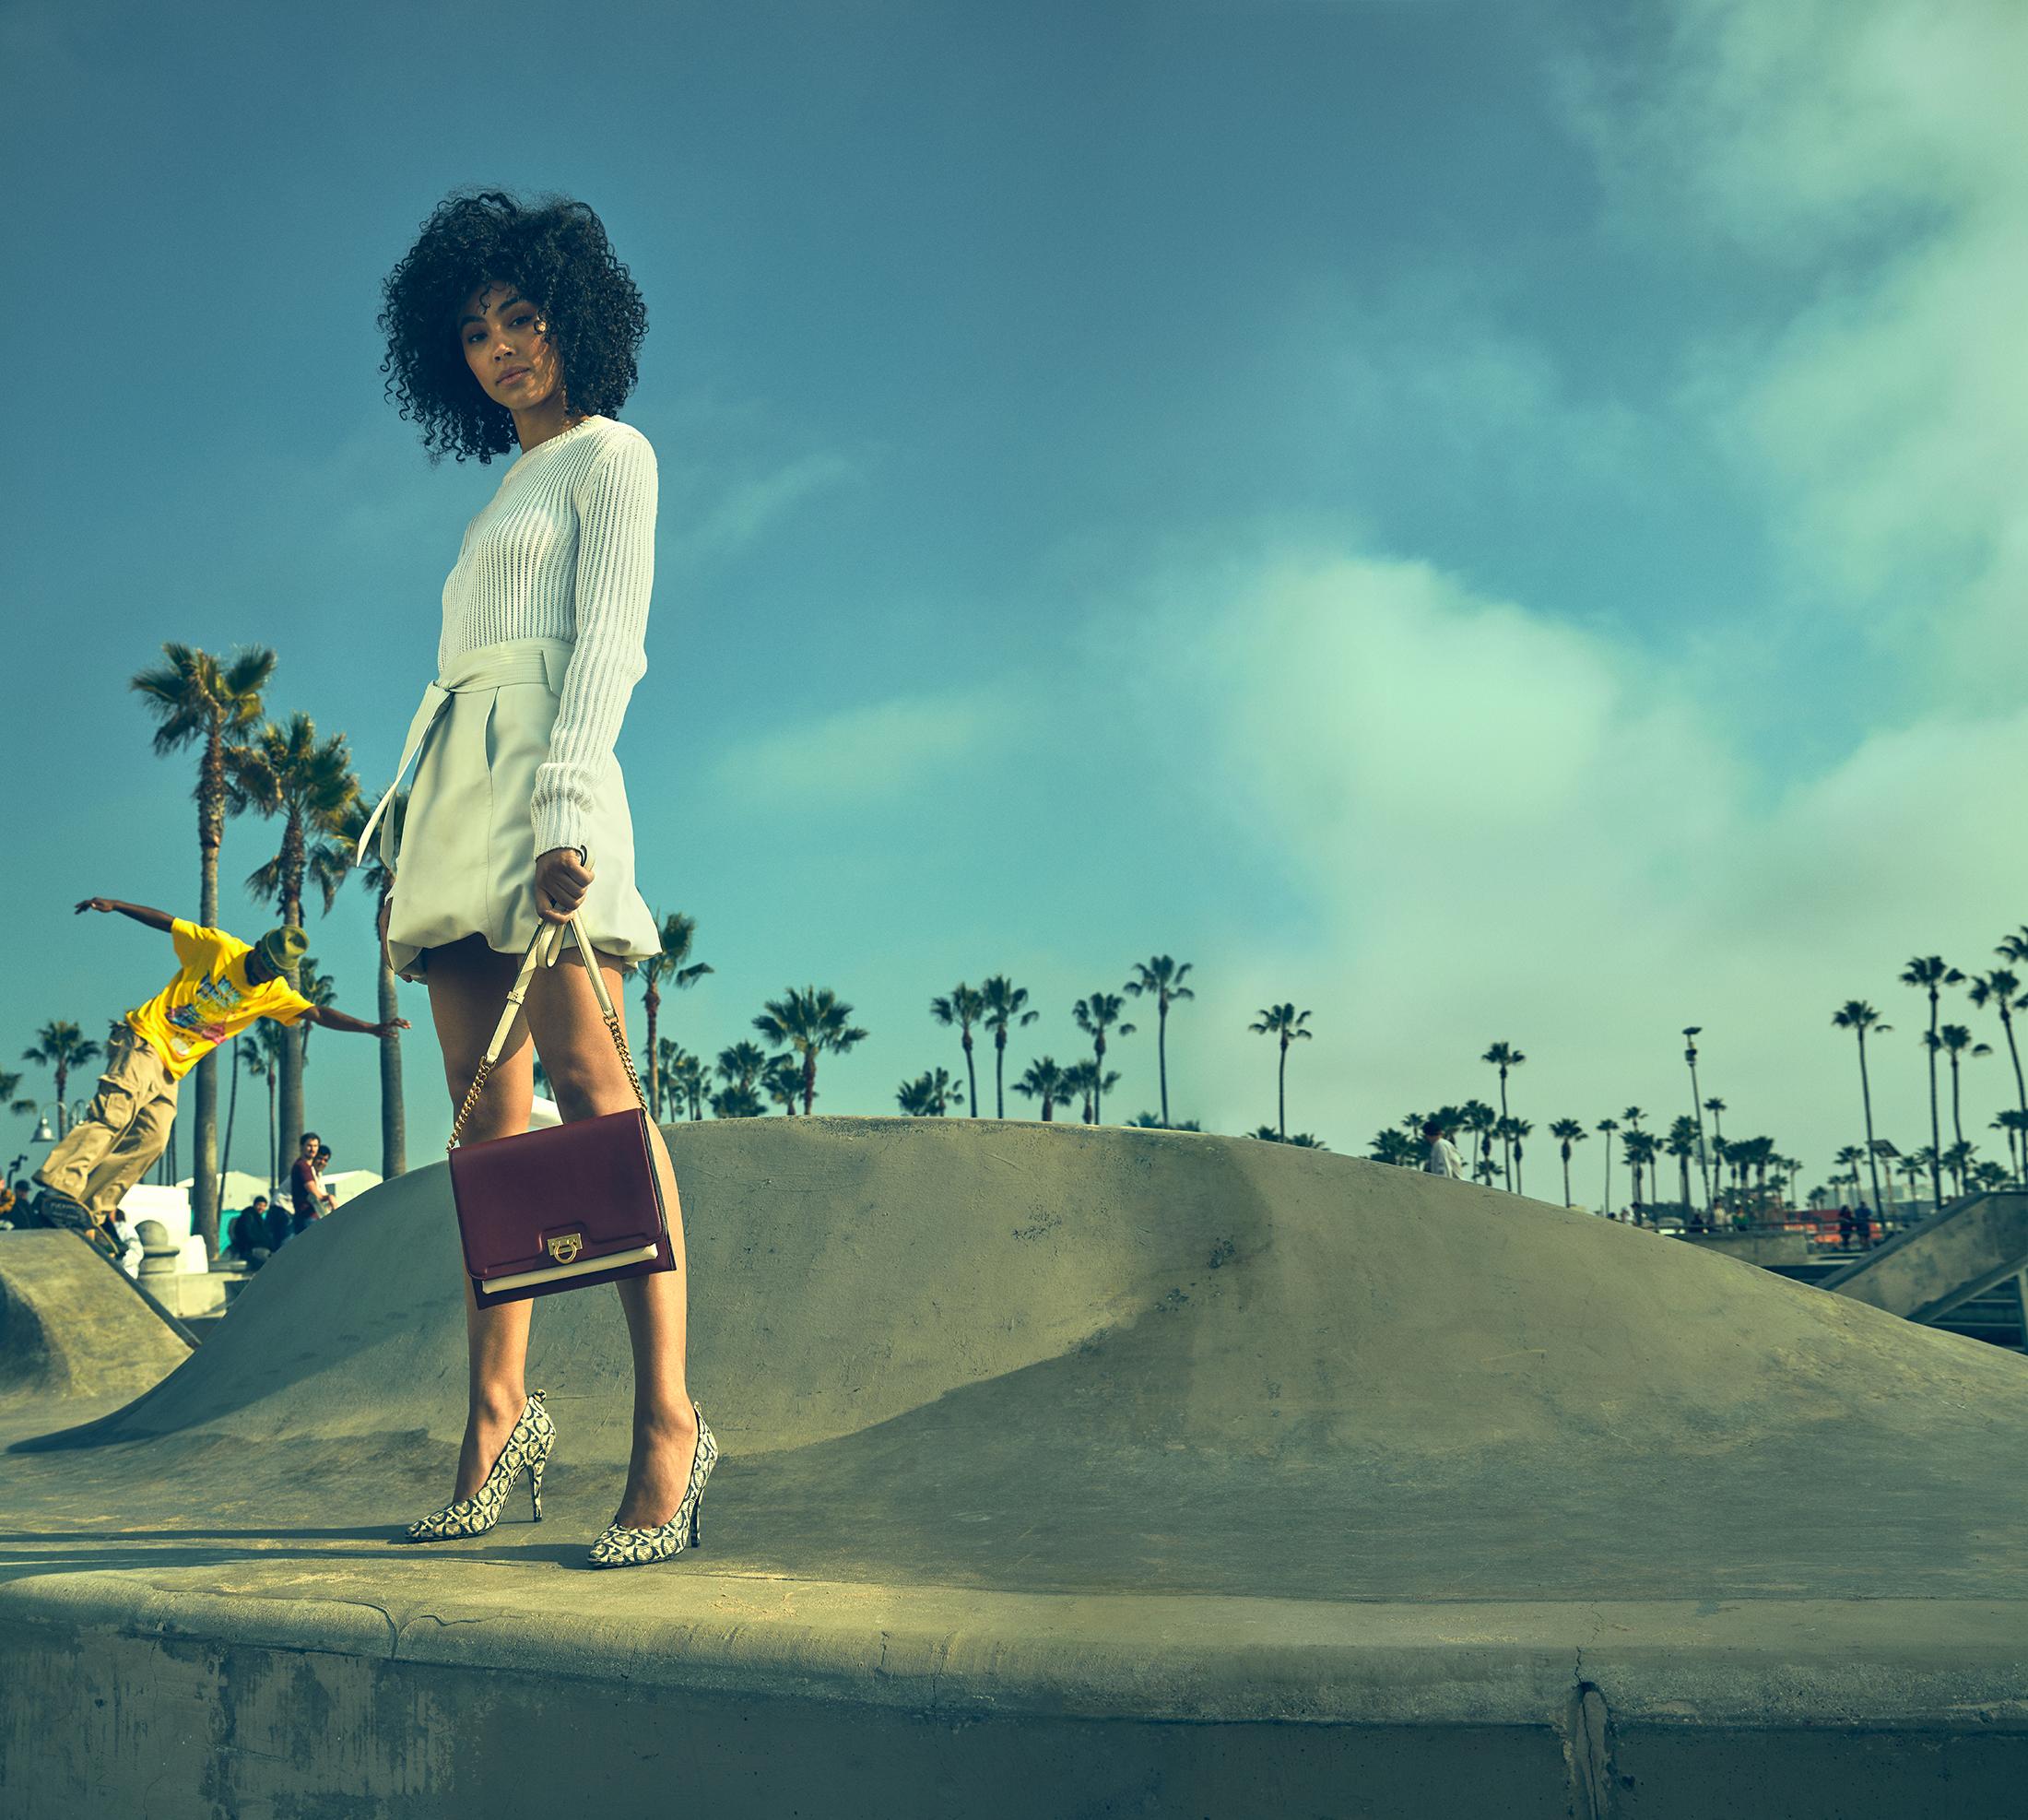 salvatore-ferragamo-rising-in-hollywood-ad-campaign-Photos